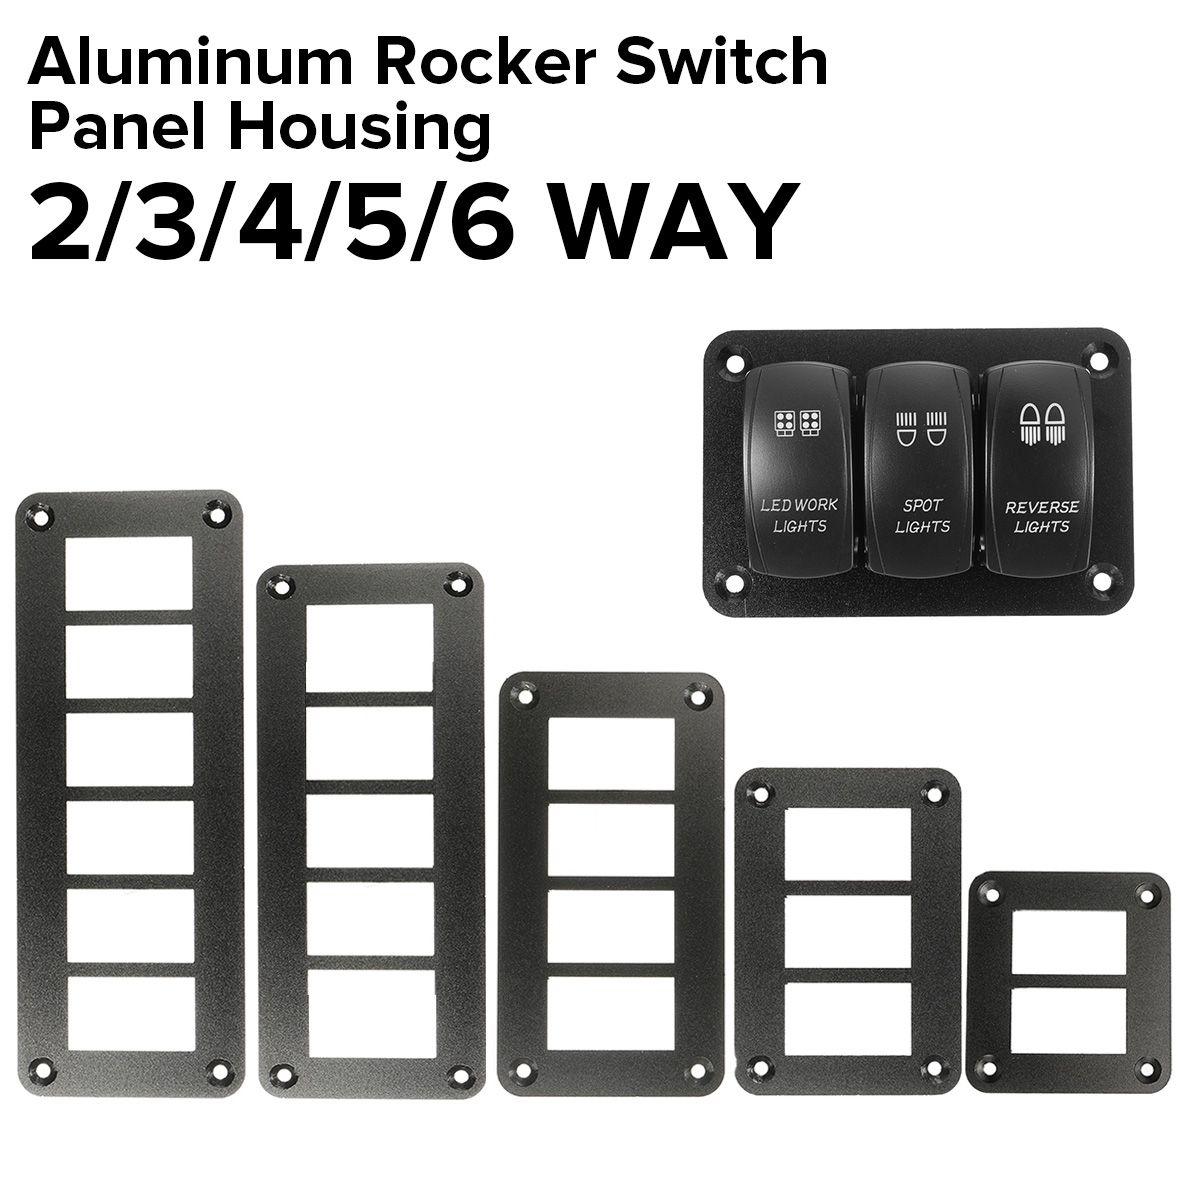 Aluminum 8 Gang Carling ARB Rocker Switch Dash Mount Holder Housing Panel